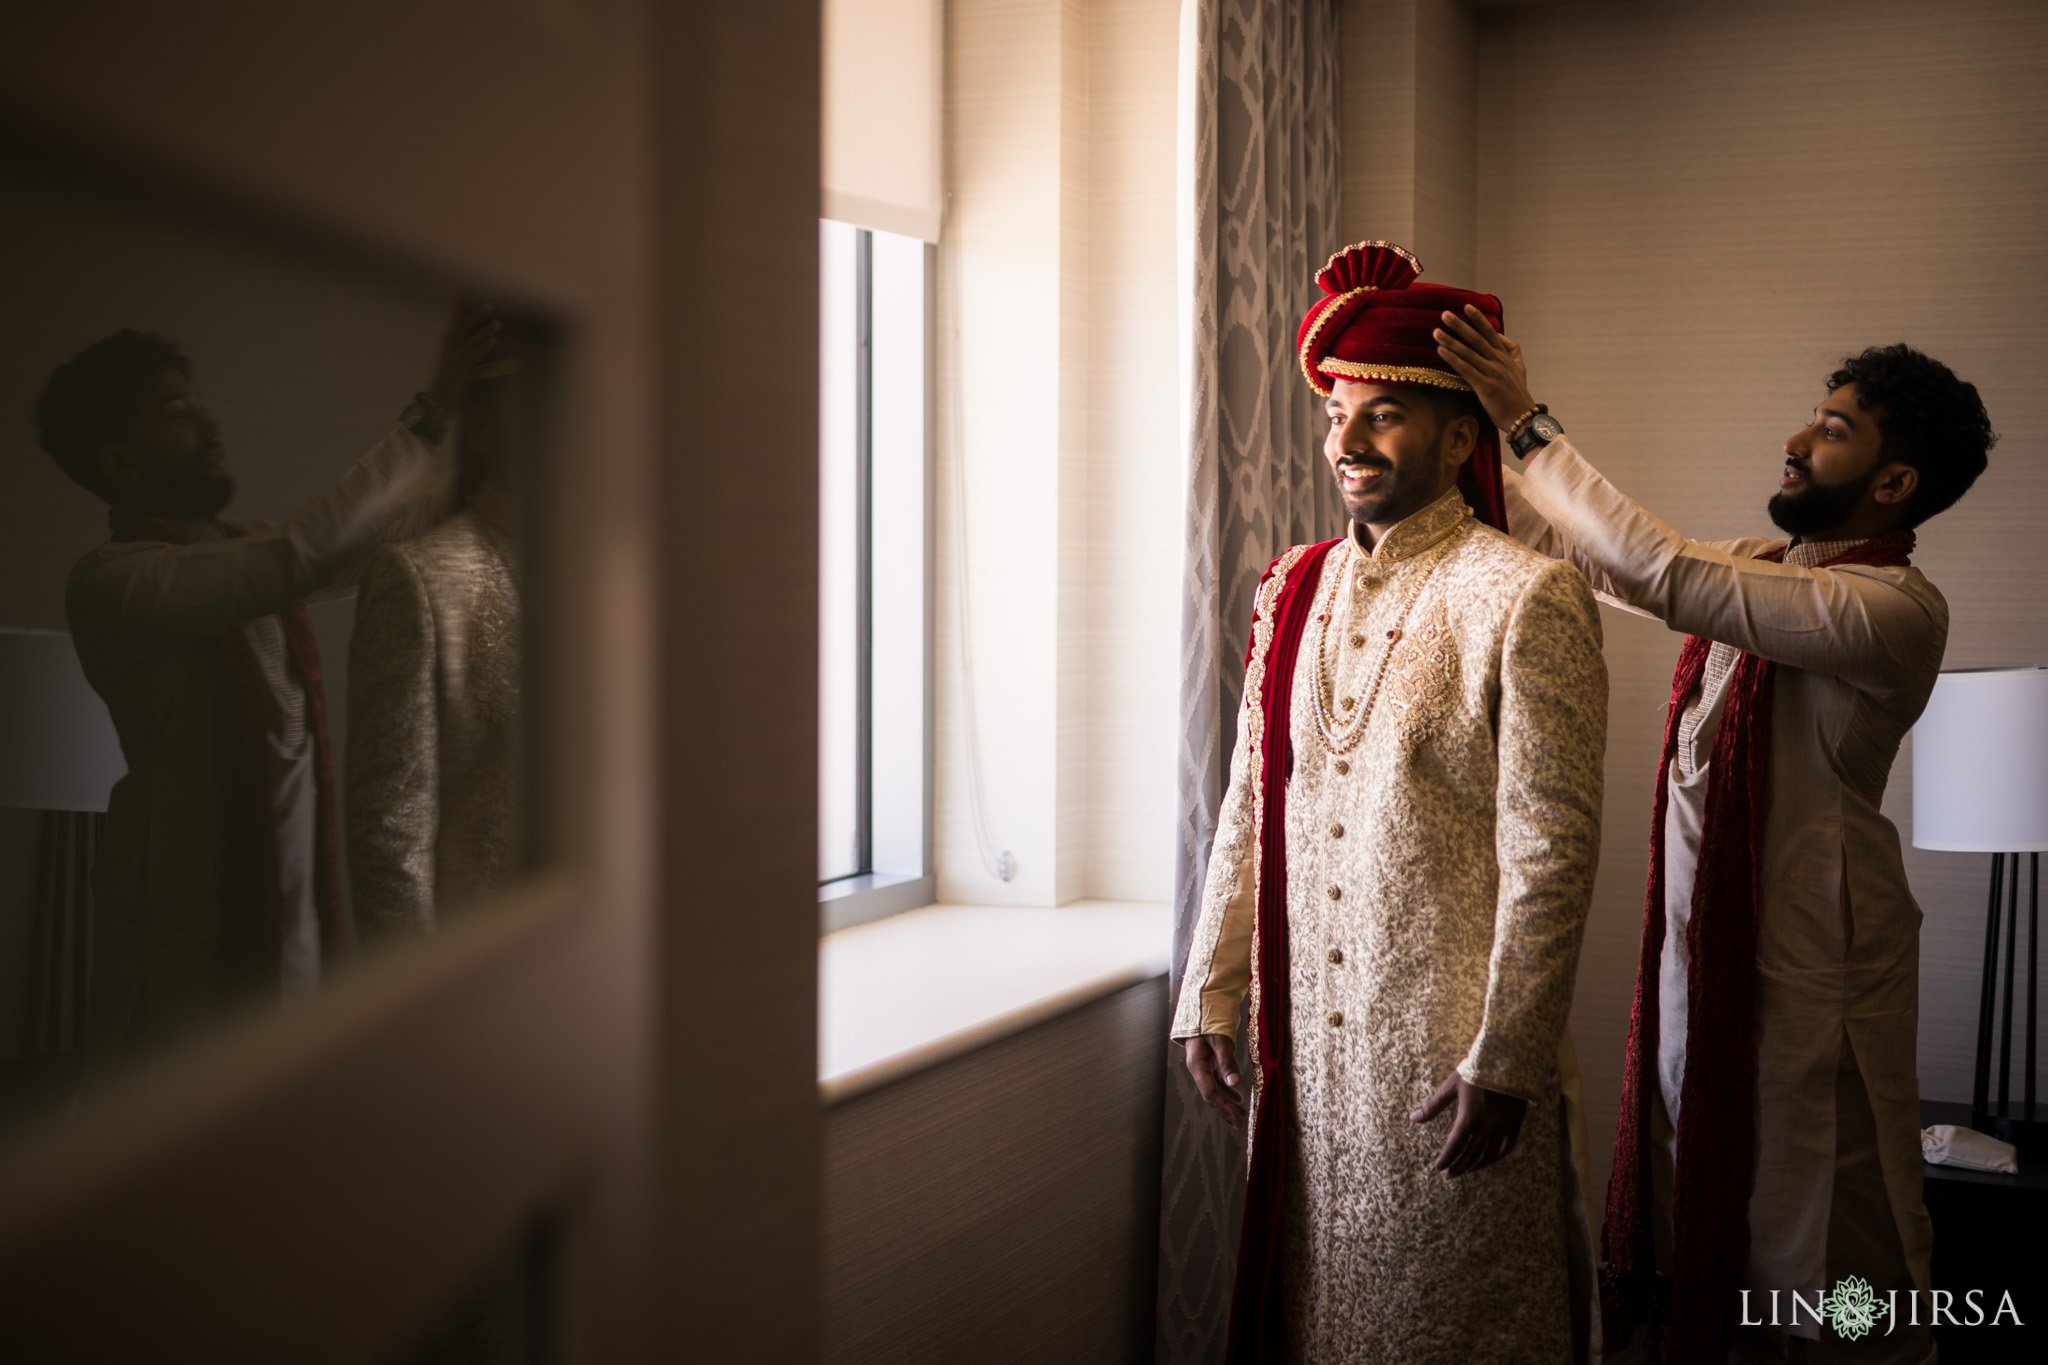 008 san jose marriott indian wedding photography